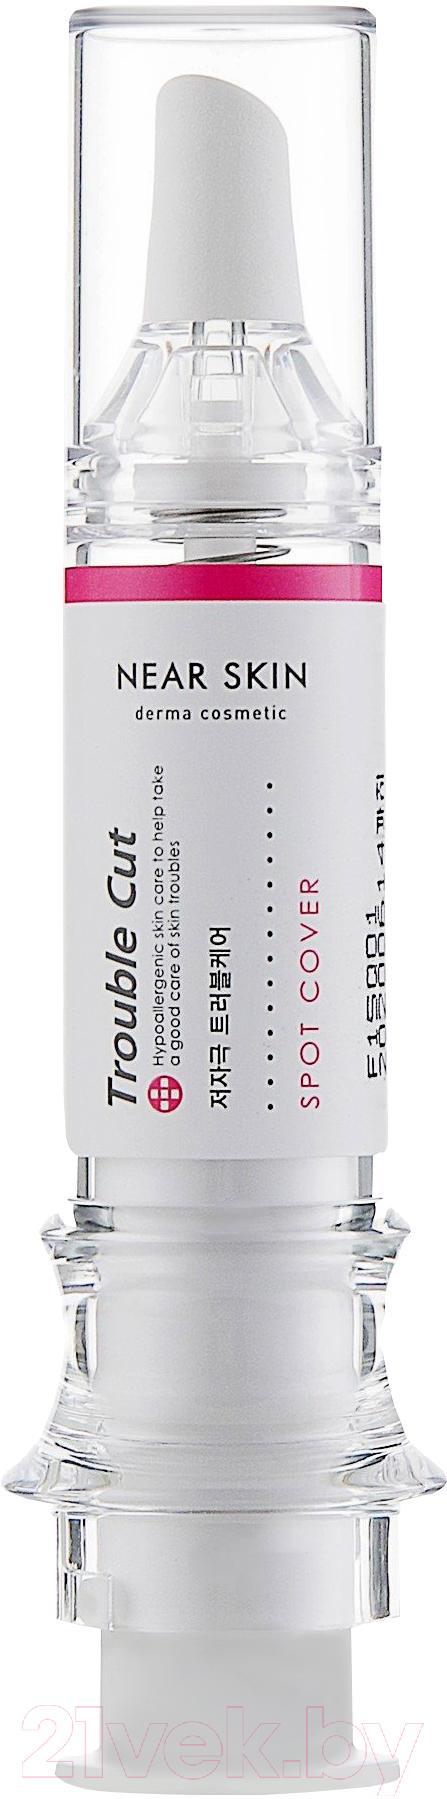 Купить Крем для лица Missha, Near Skin для проблемной кожи (7г), Южная корея, Near Skin (Missha)